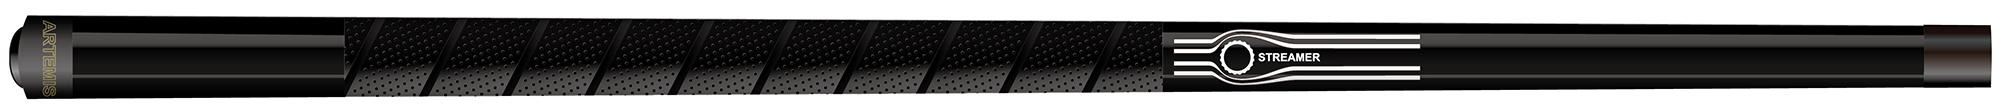 CK0241-BLA: Artemis Mister 100® Streamer Black #1